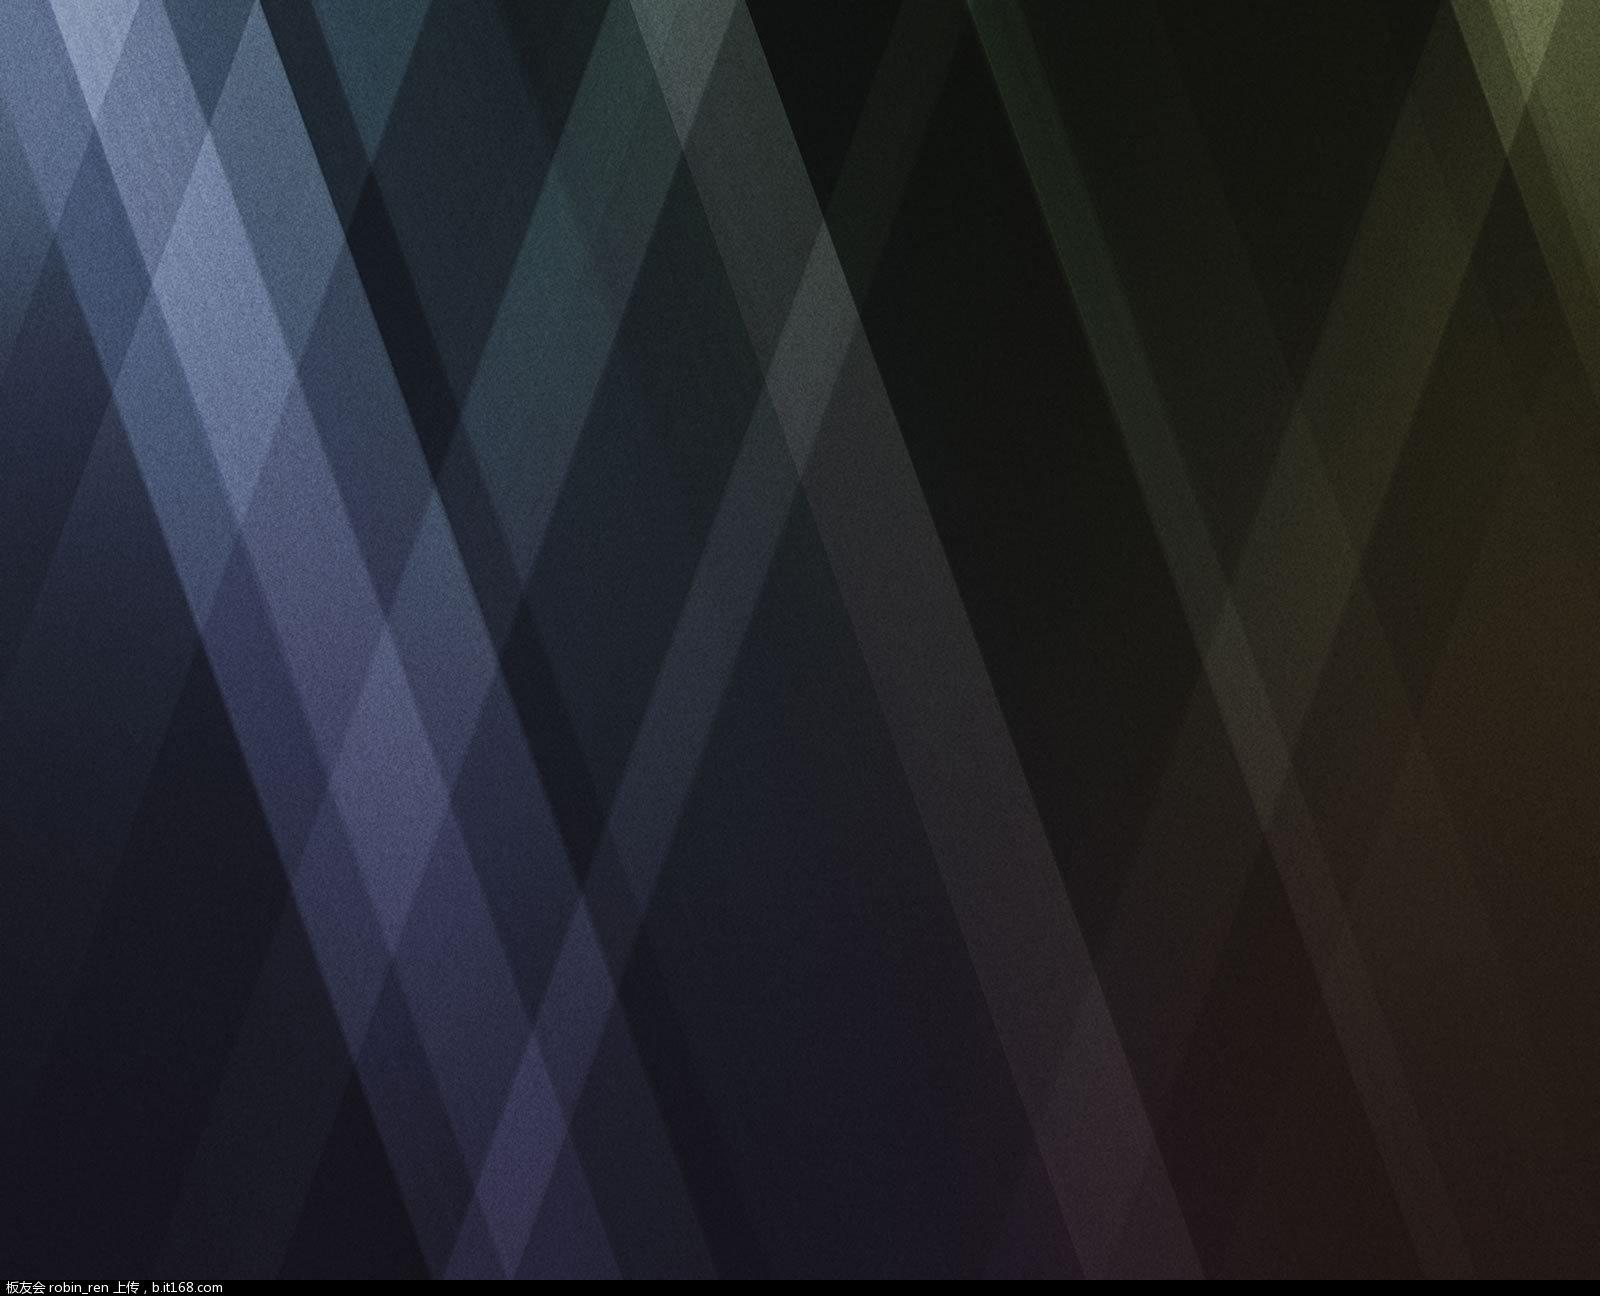 wallpaper_09.jpg